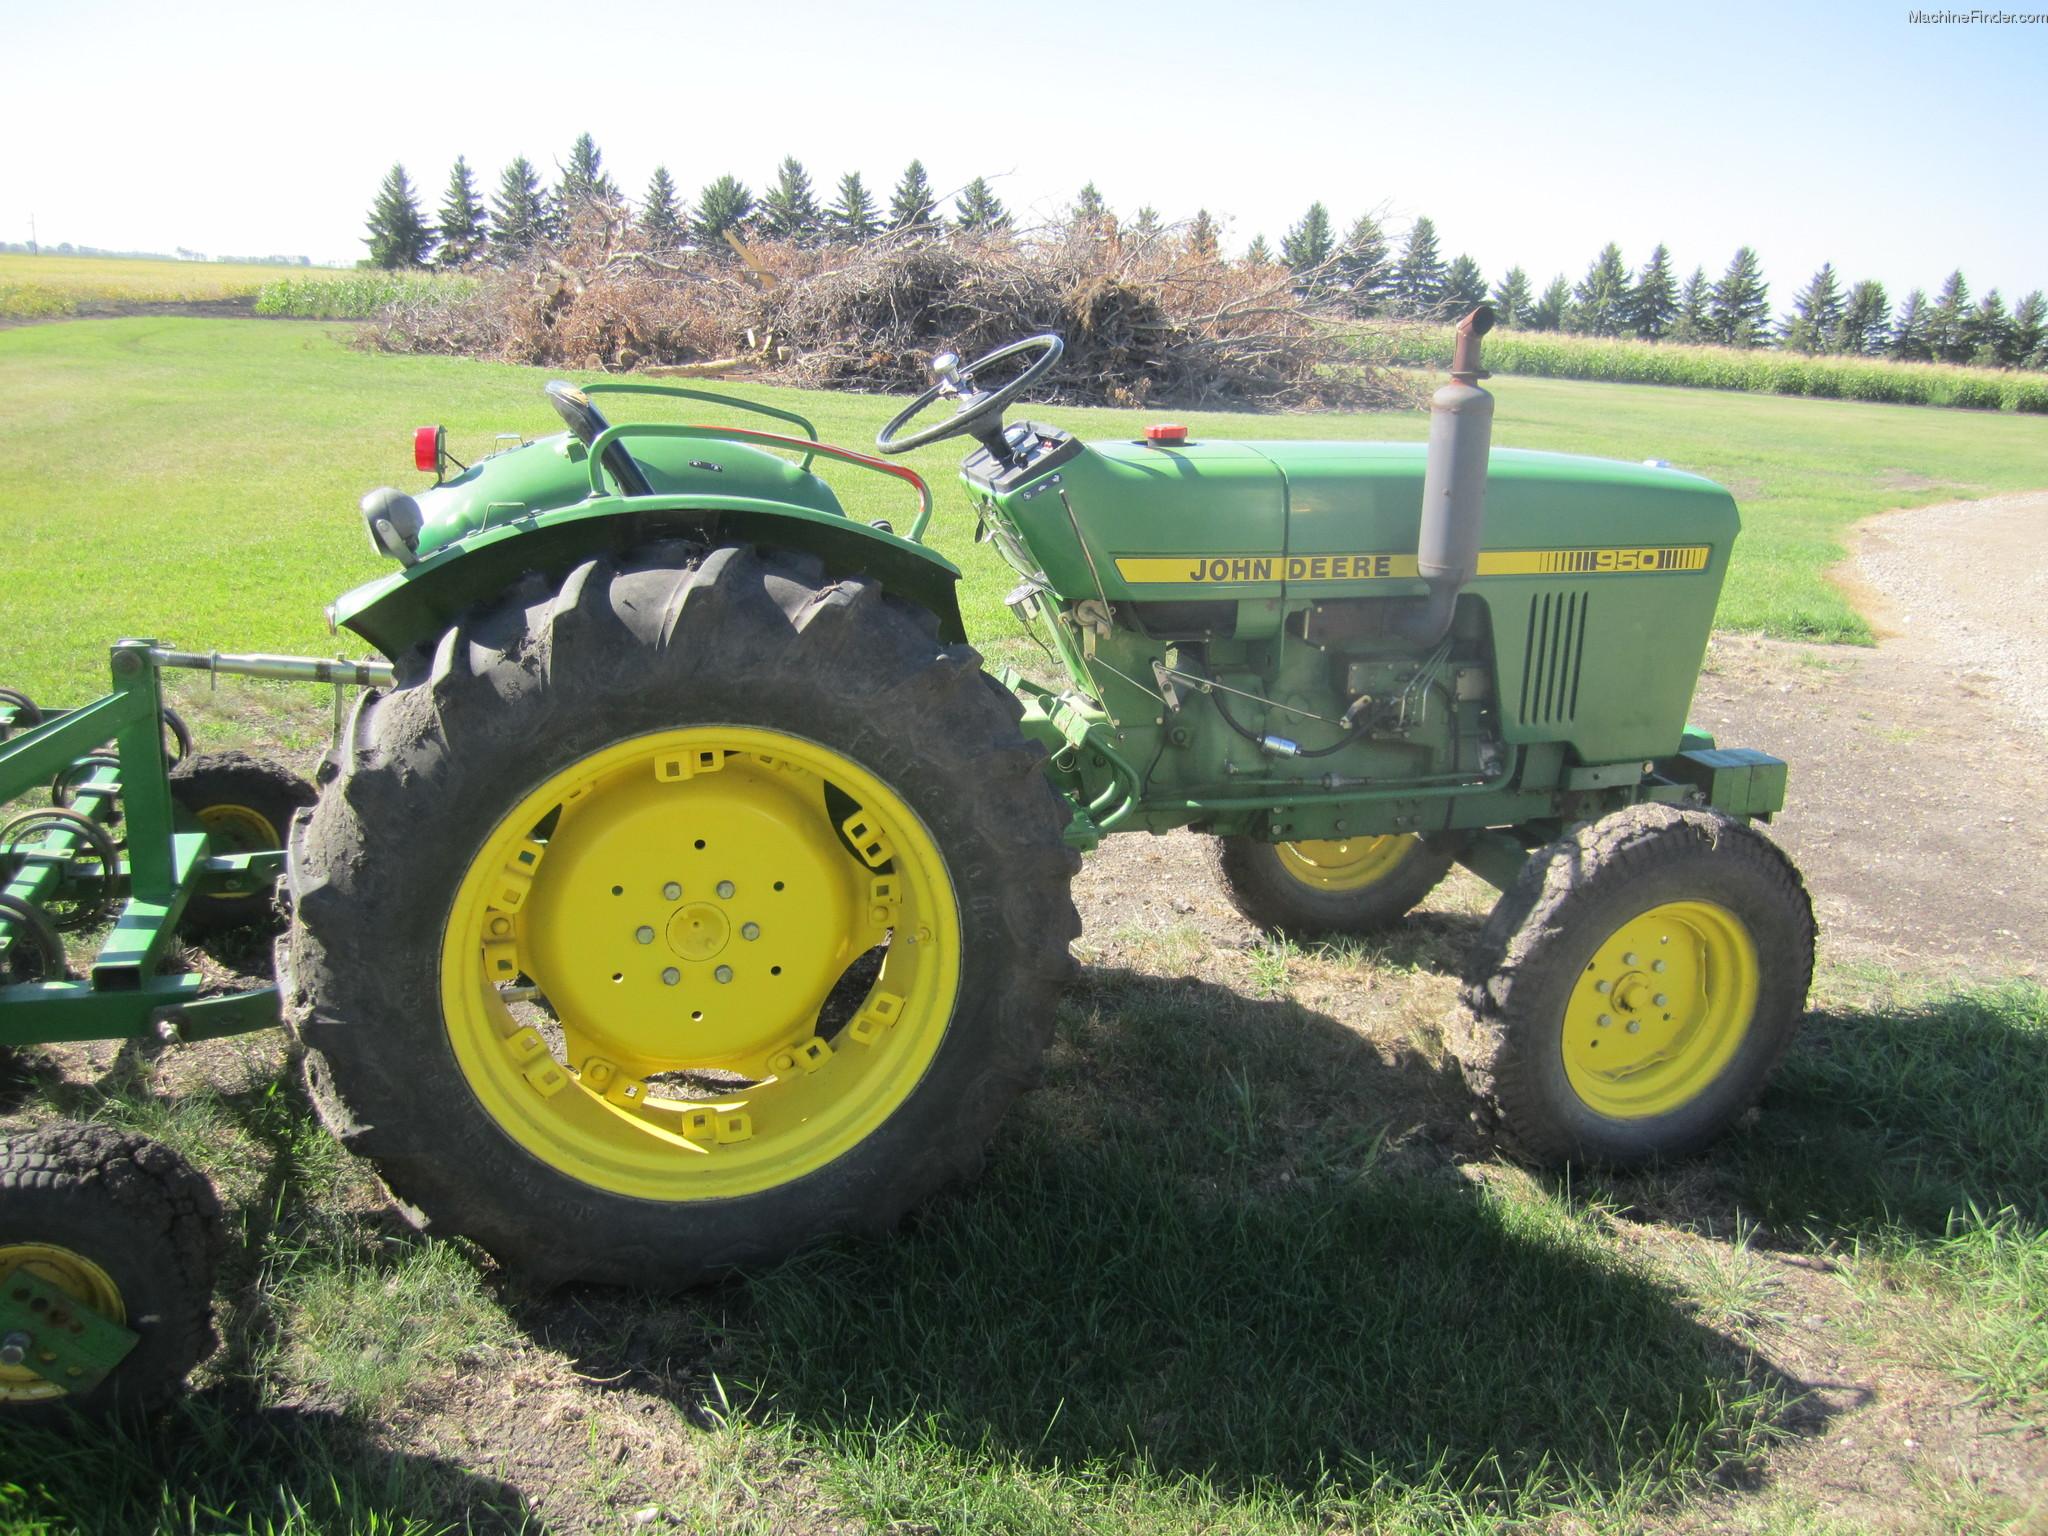 1979 John Deere 950 Tractors - Compact (1-40hp.) - John ...